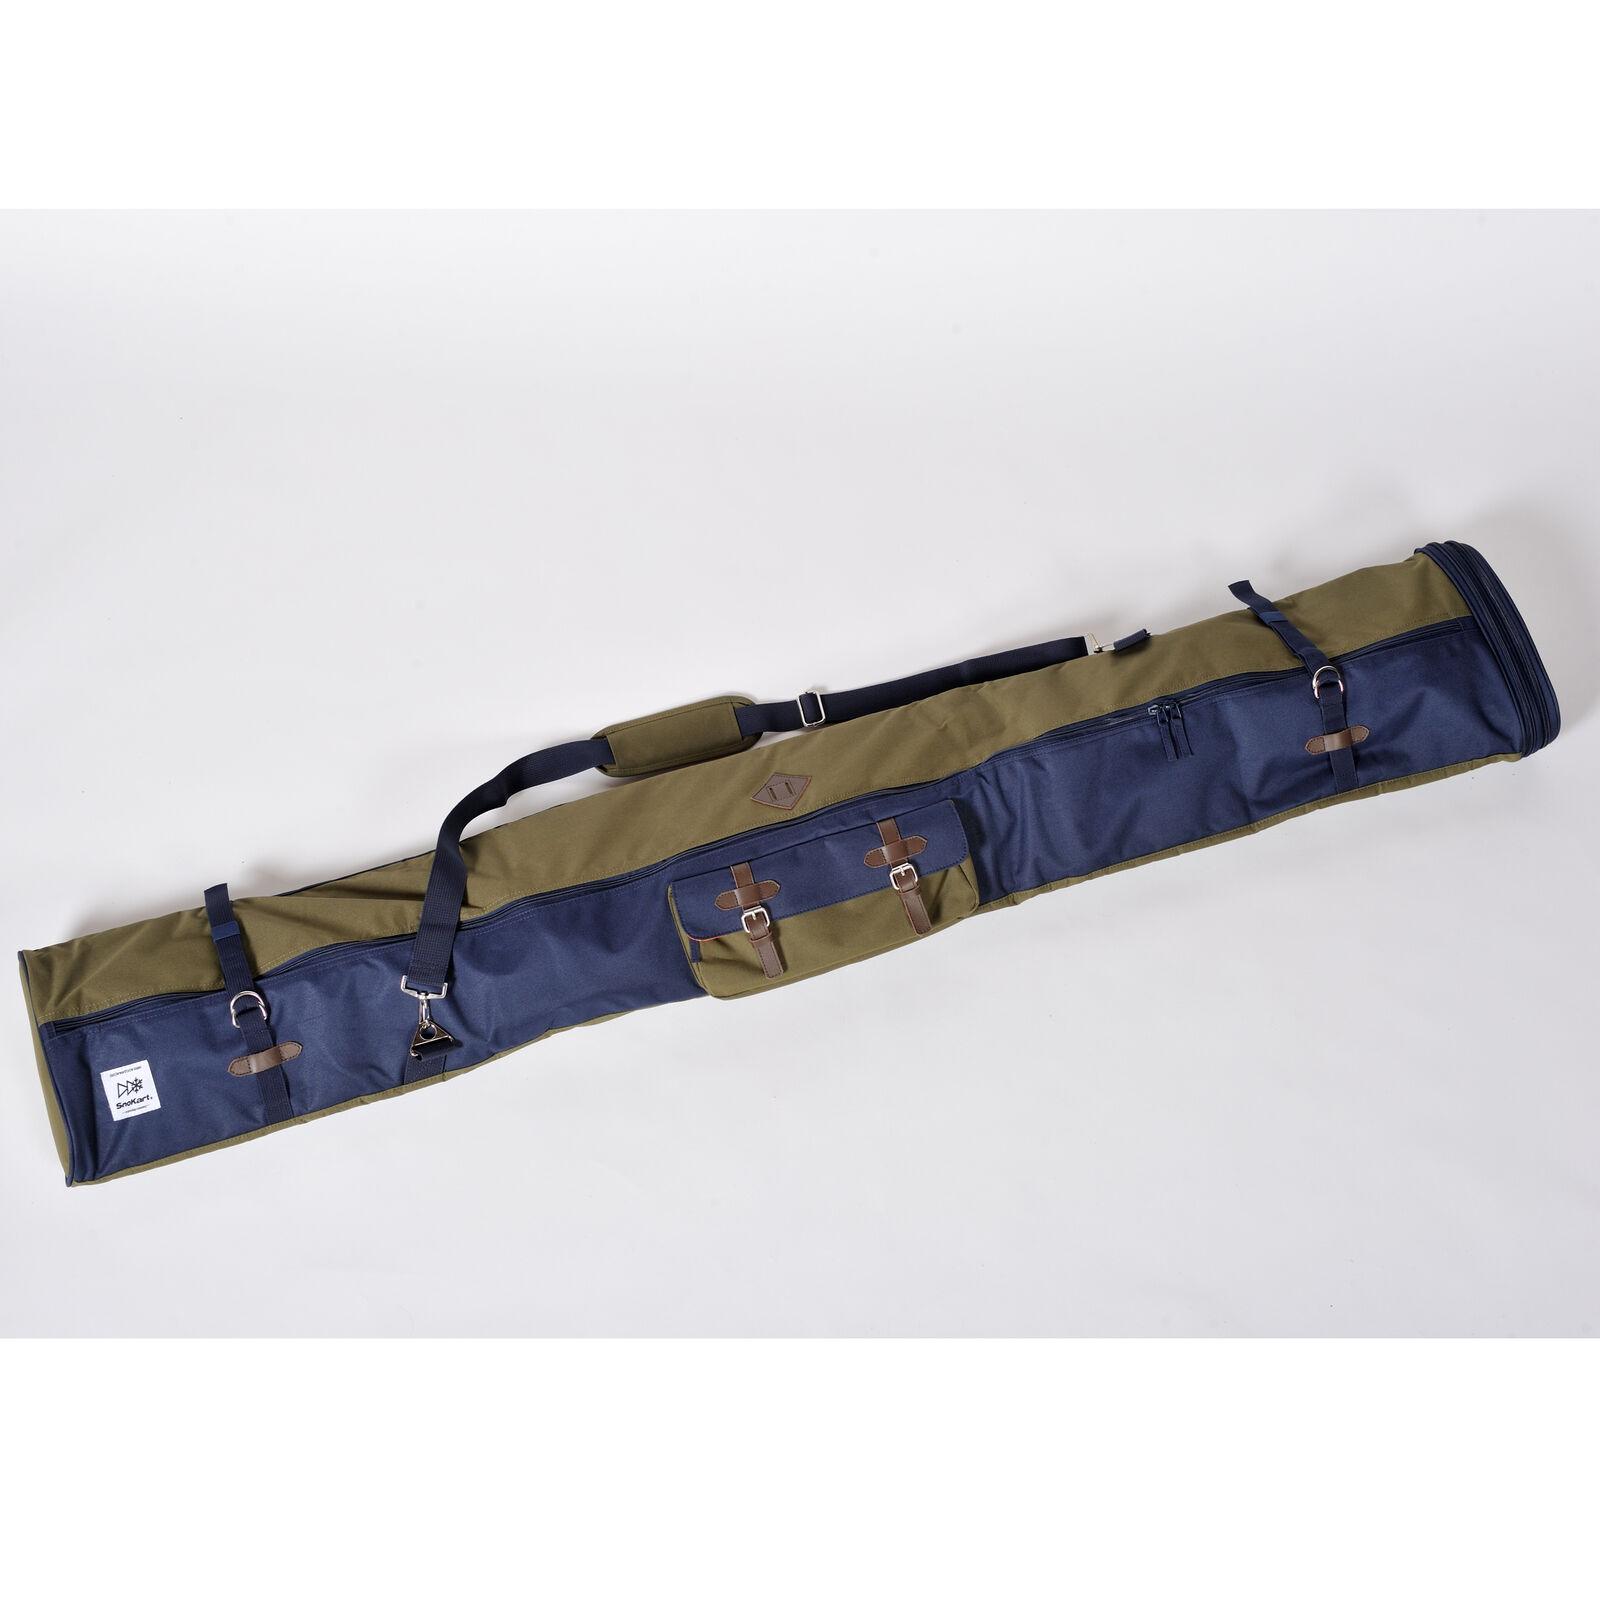 SnoKart Kanvas Ski Zoom Mini 130-160cm Ski Carry Bag Extendible Fern Denim